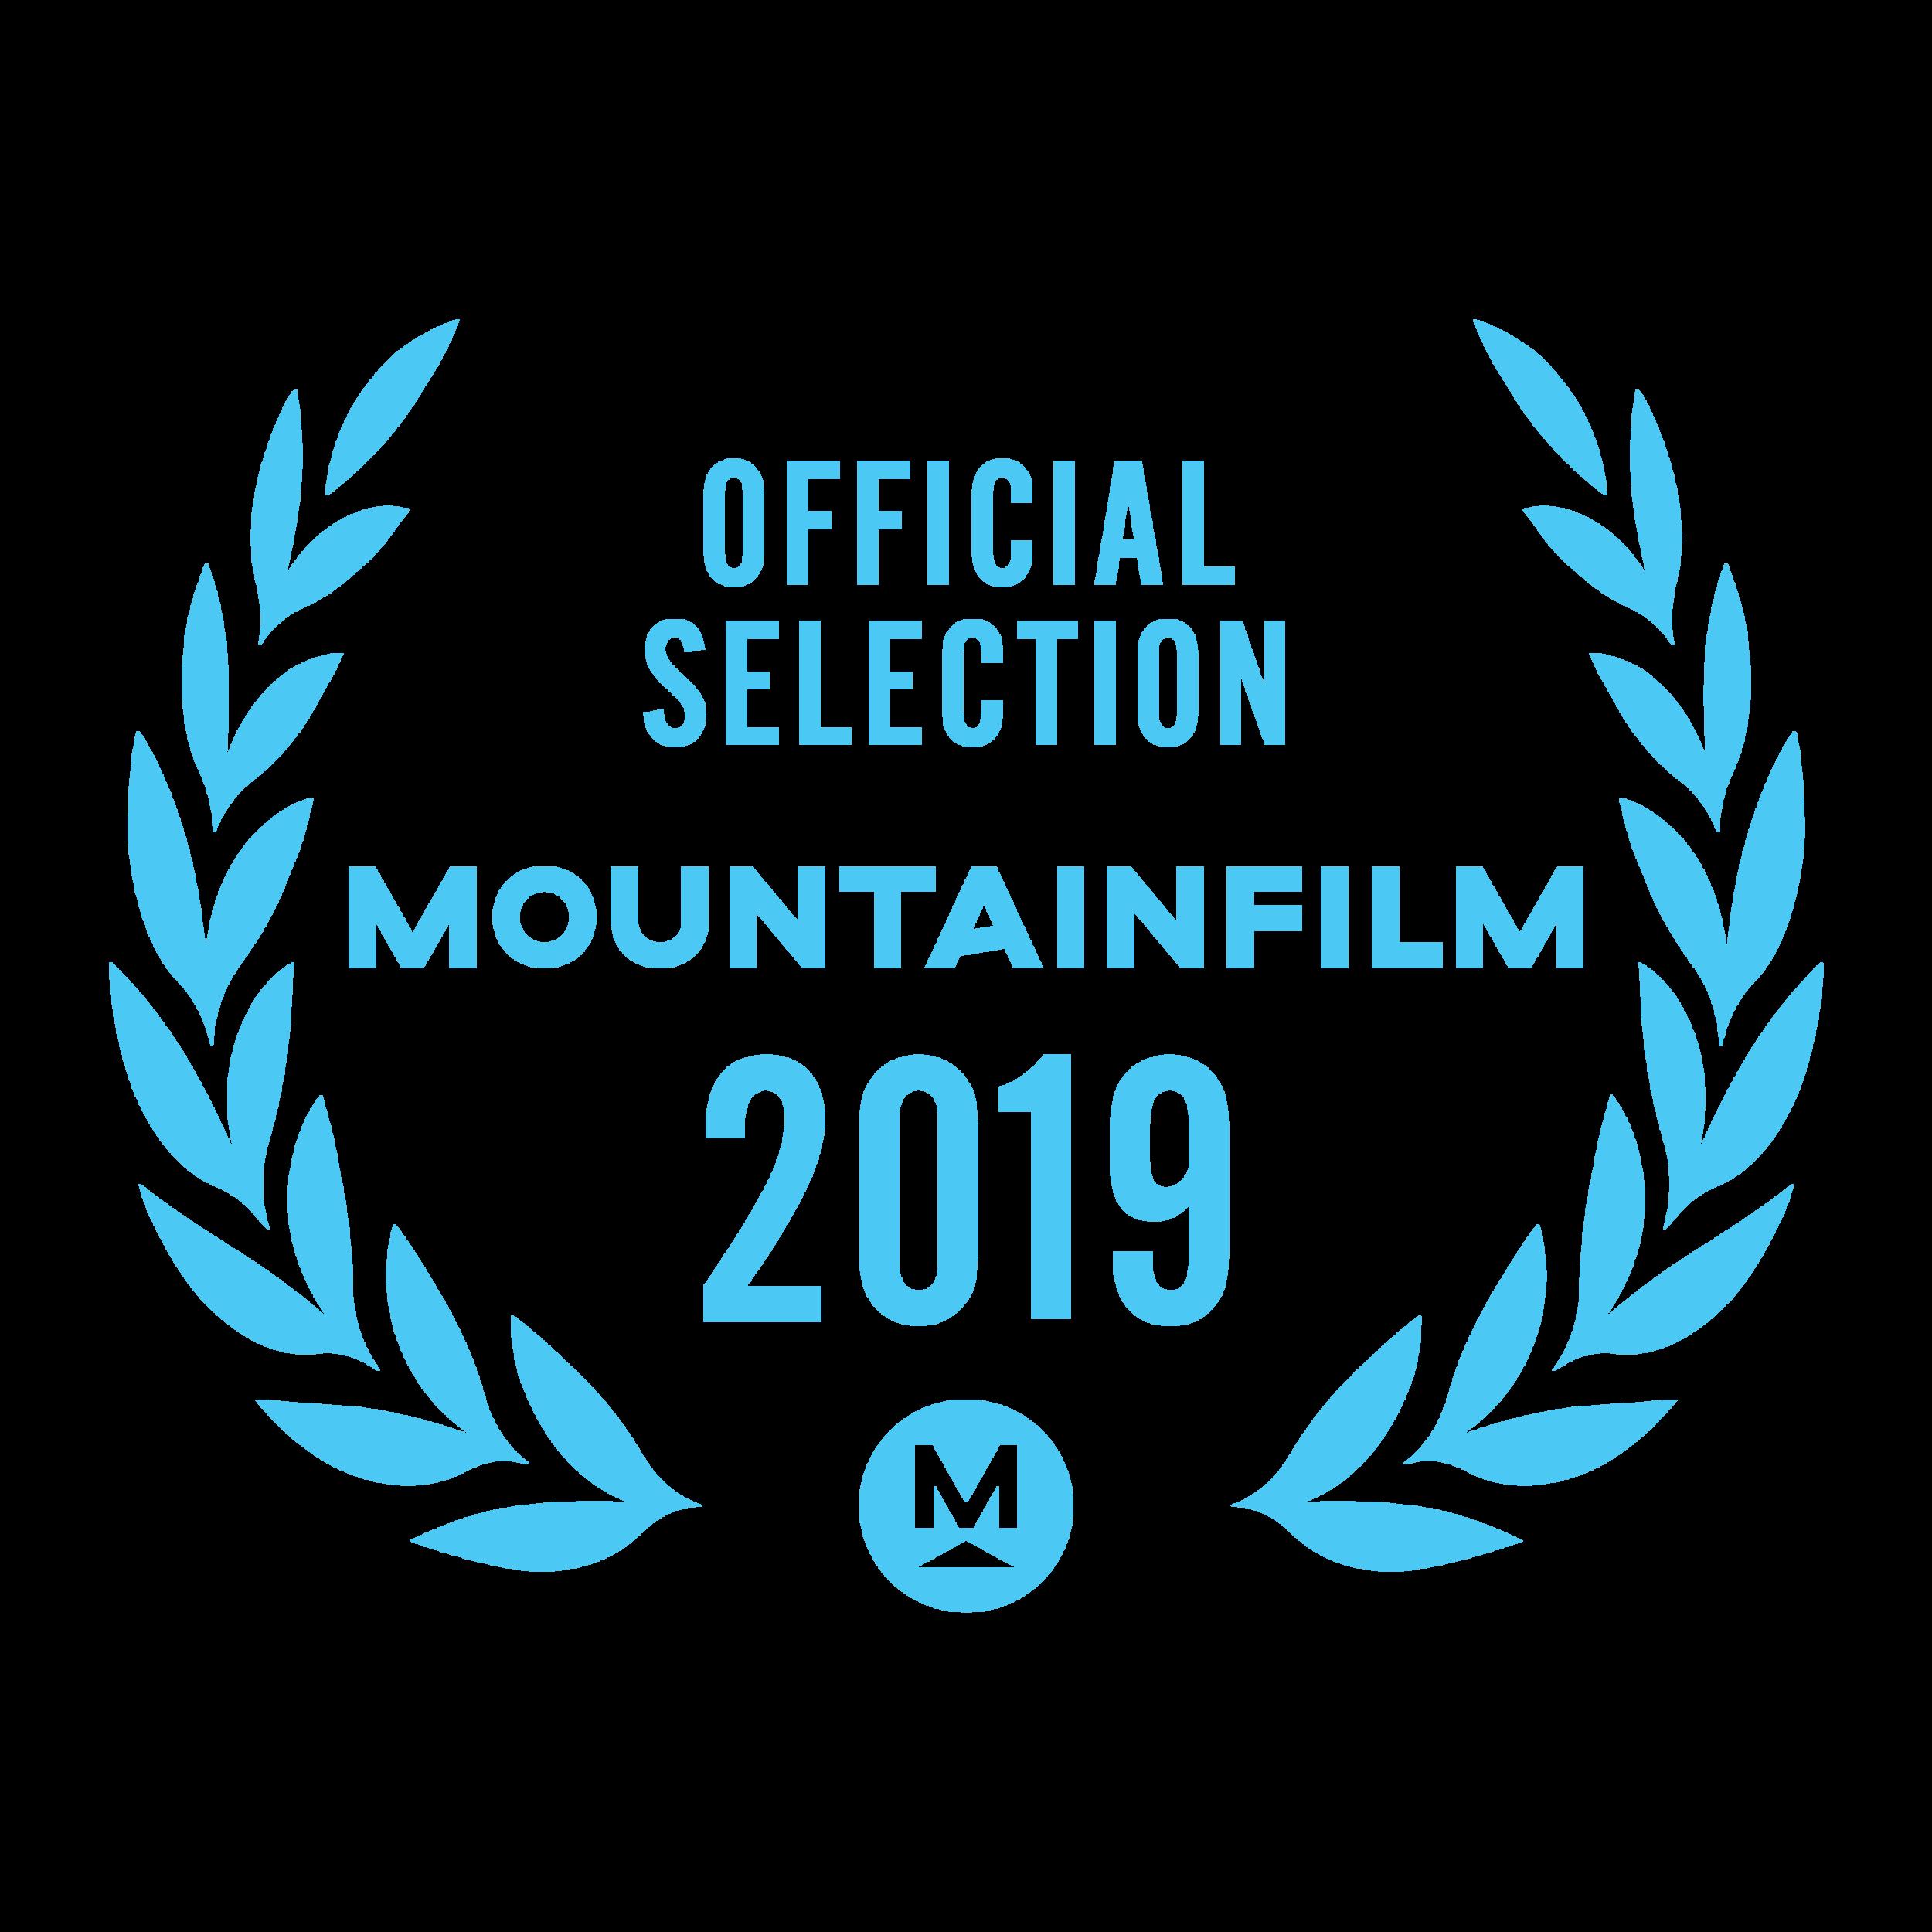 Mountainfilm2019-OfficialSelection-Blue.png